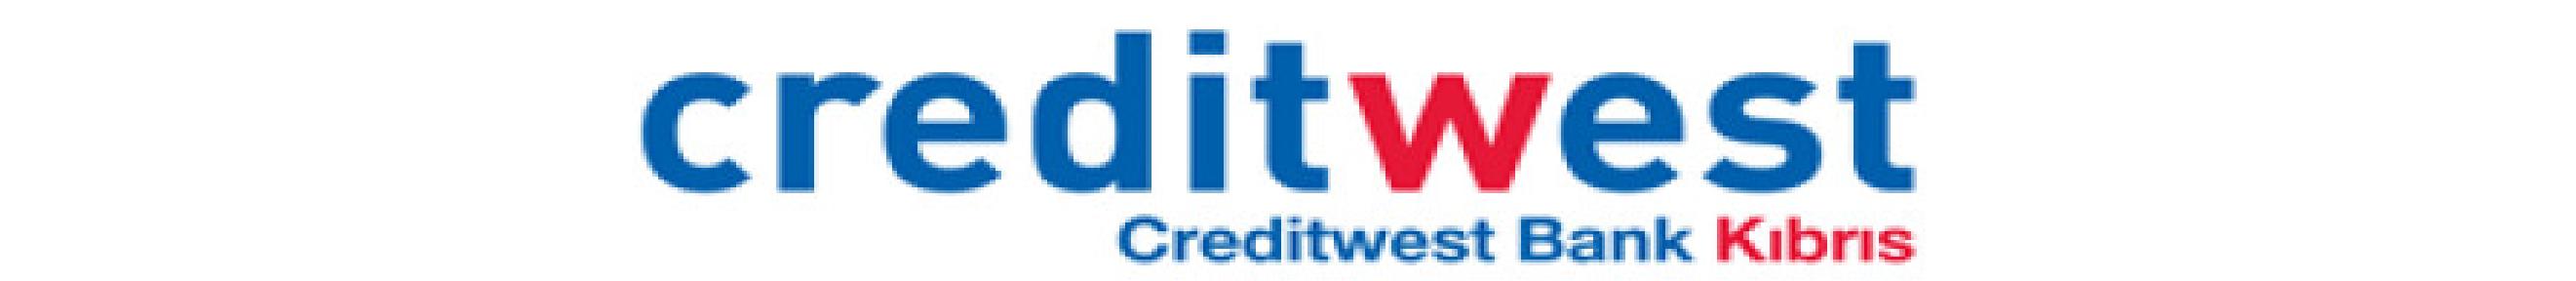 creditwest_1